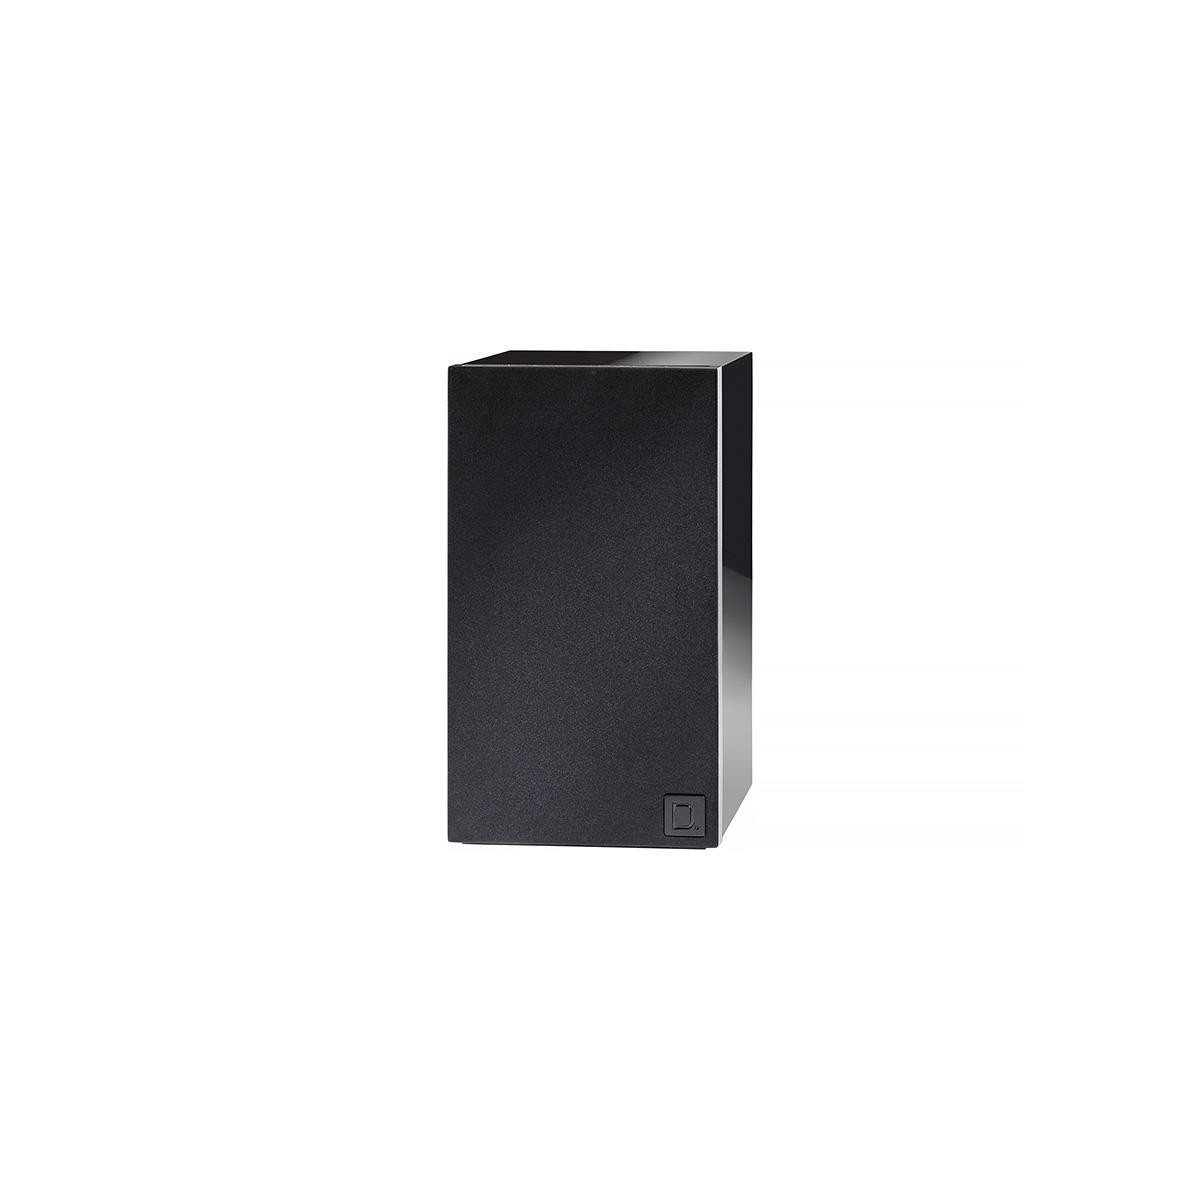 Kompaktlautsprecher DEMAND 7 (Paarpreis)